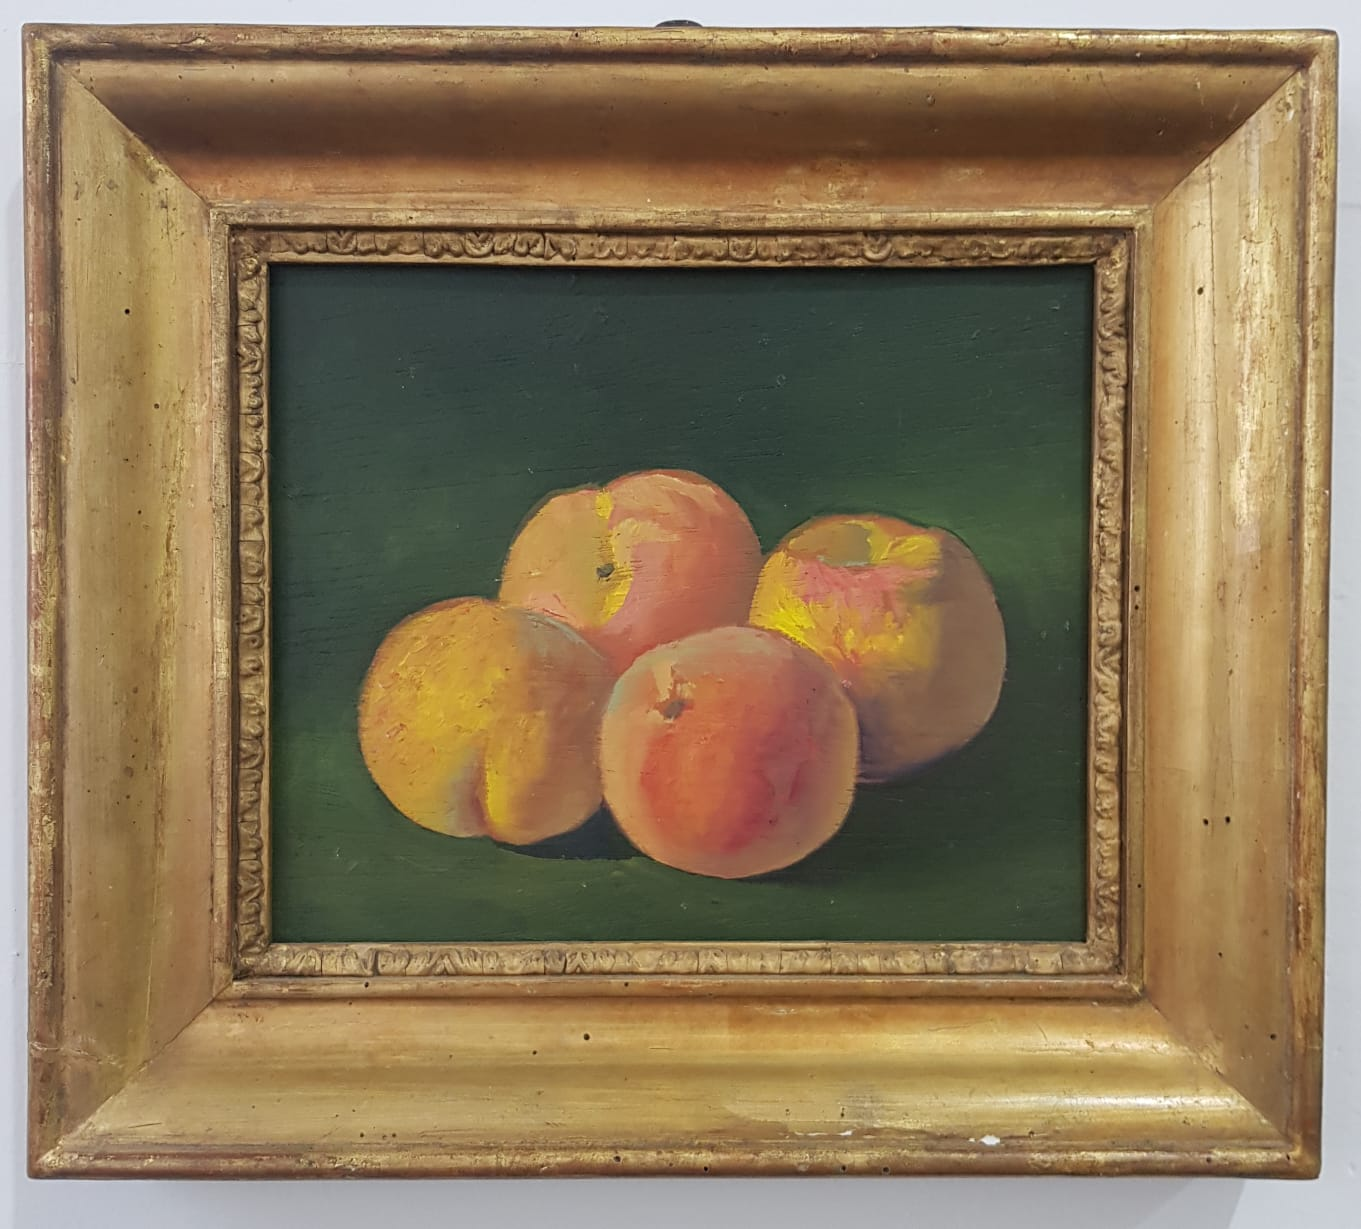 Salvo, Senza titolo, 1983, olio su tavola, cm 28,5x23,5